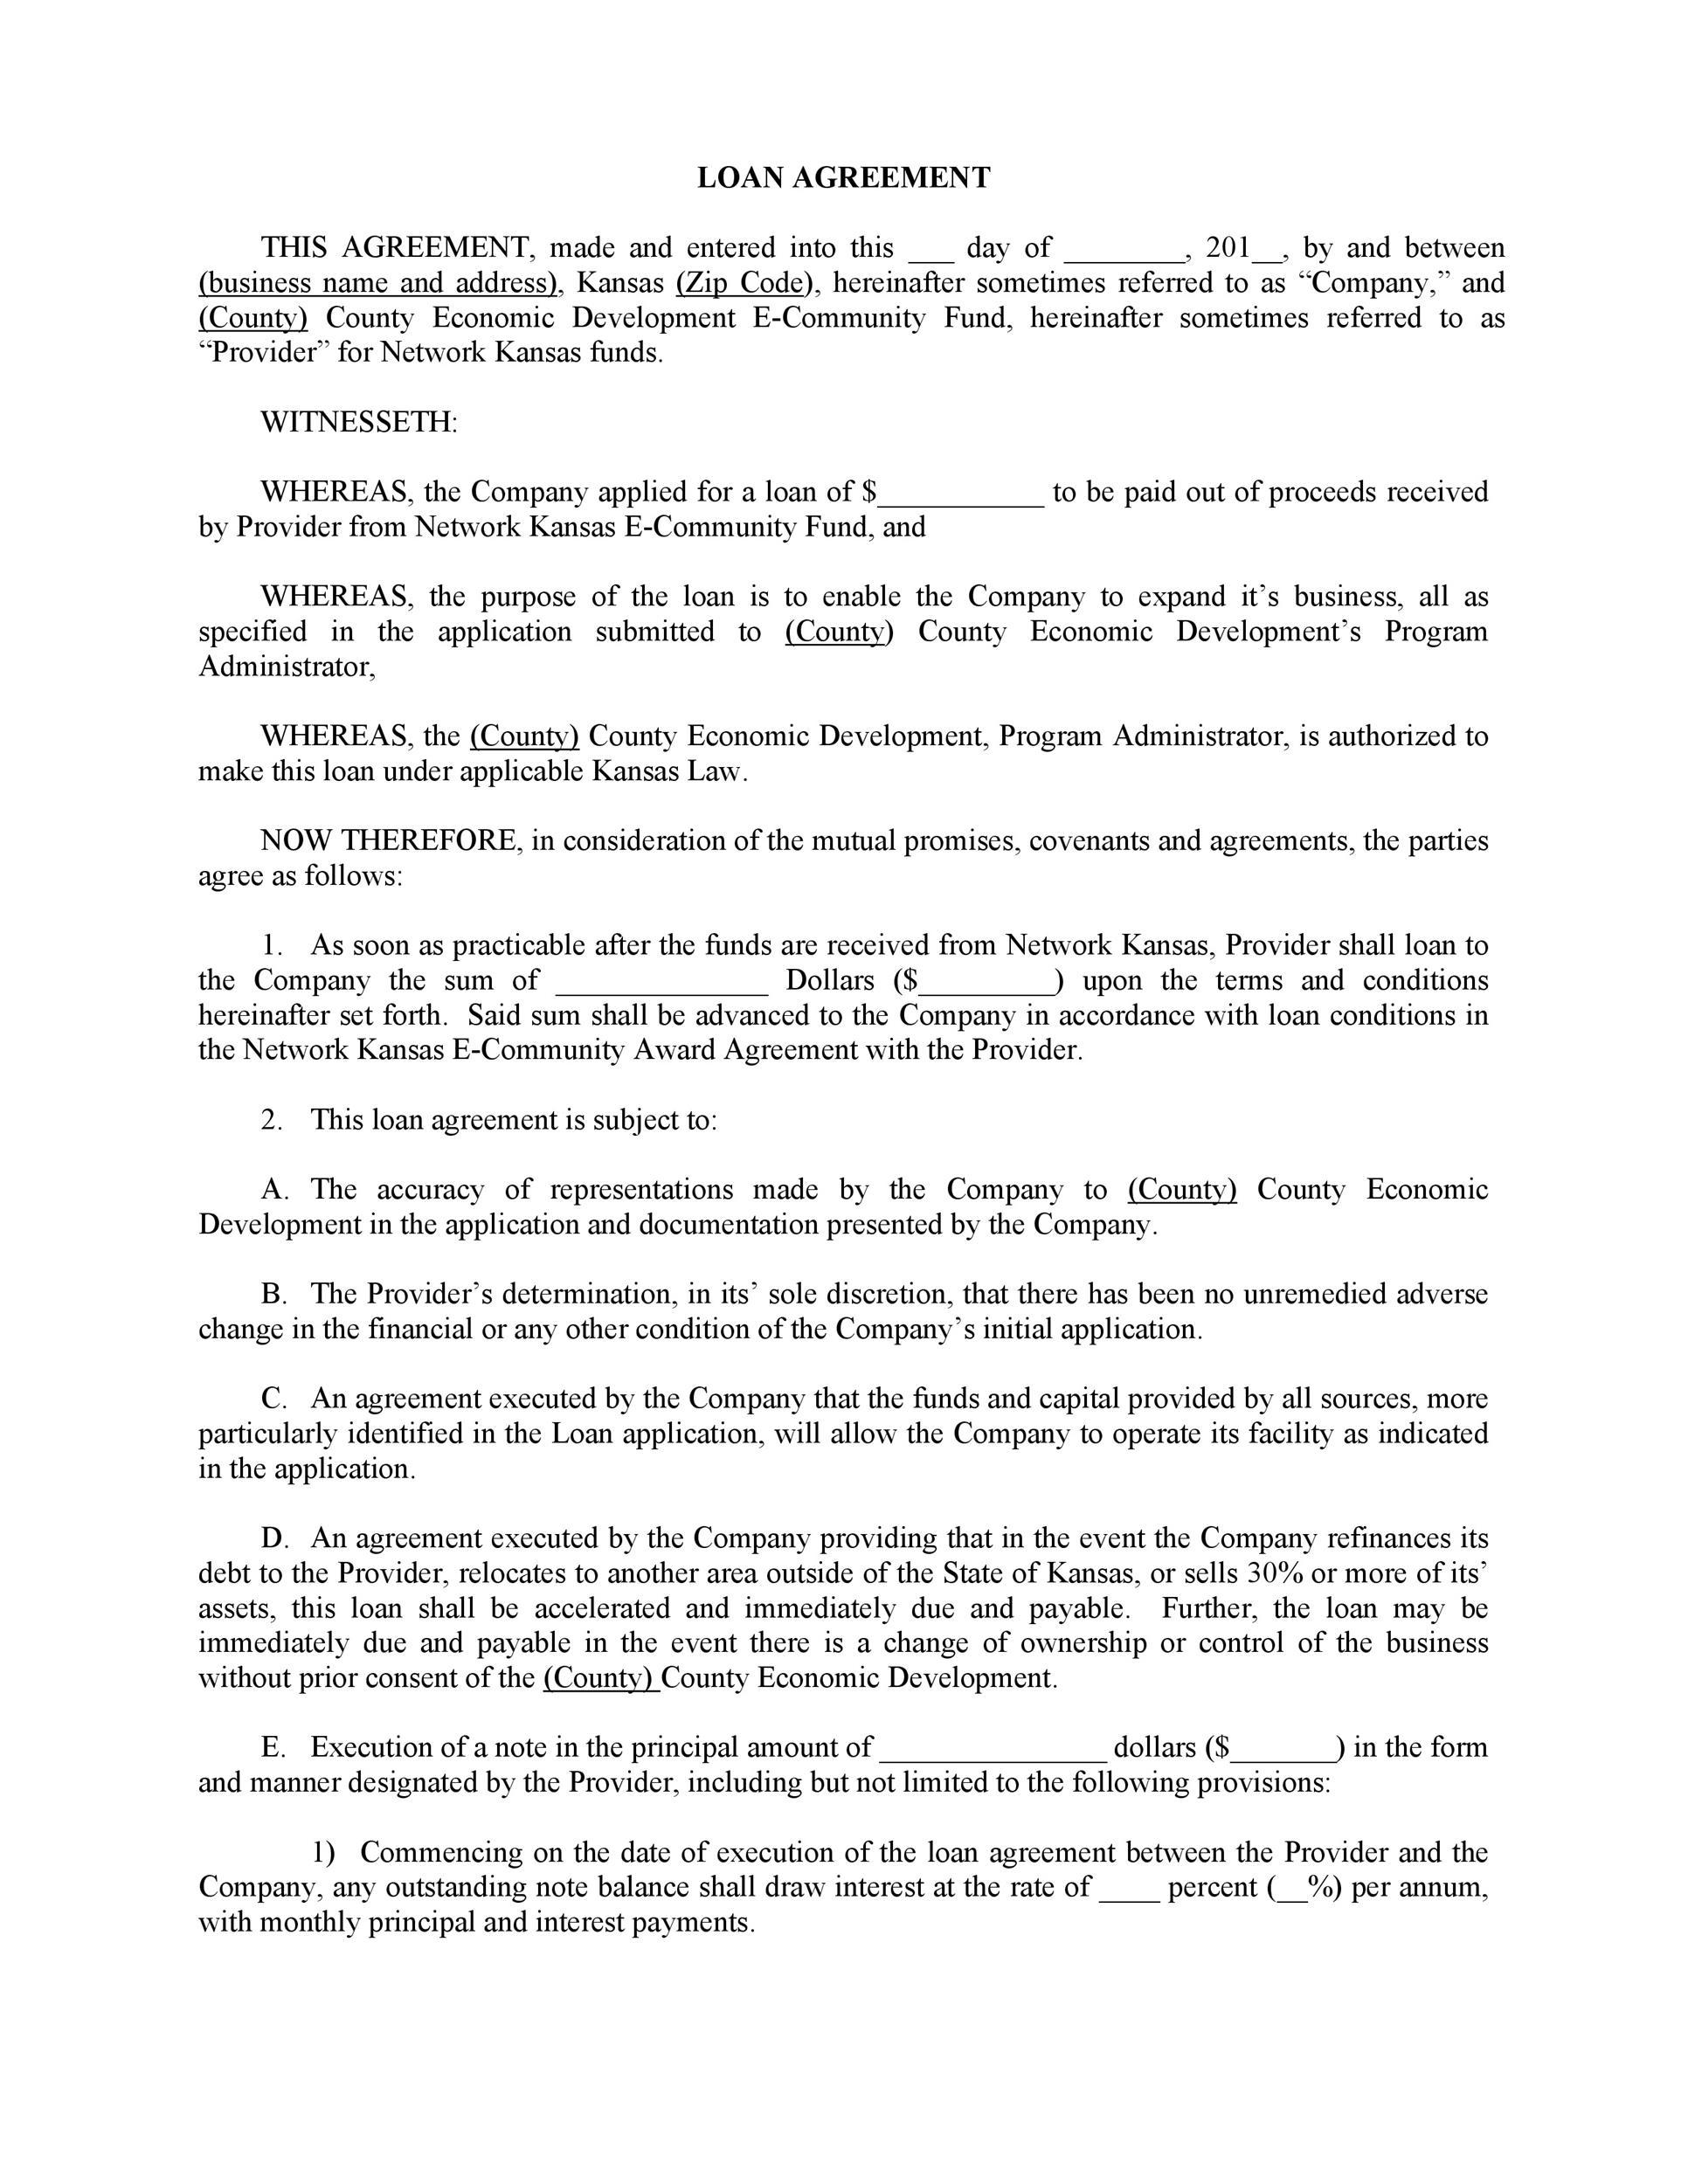 loan-agreement-template-22.jpg